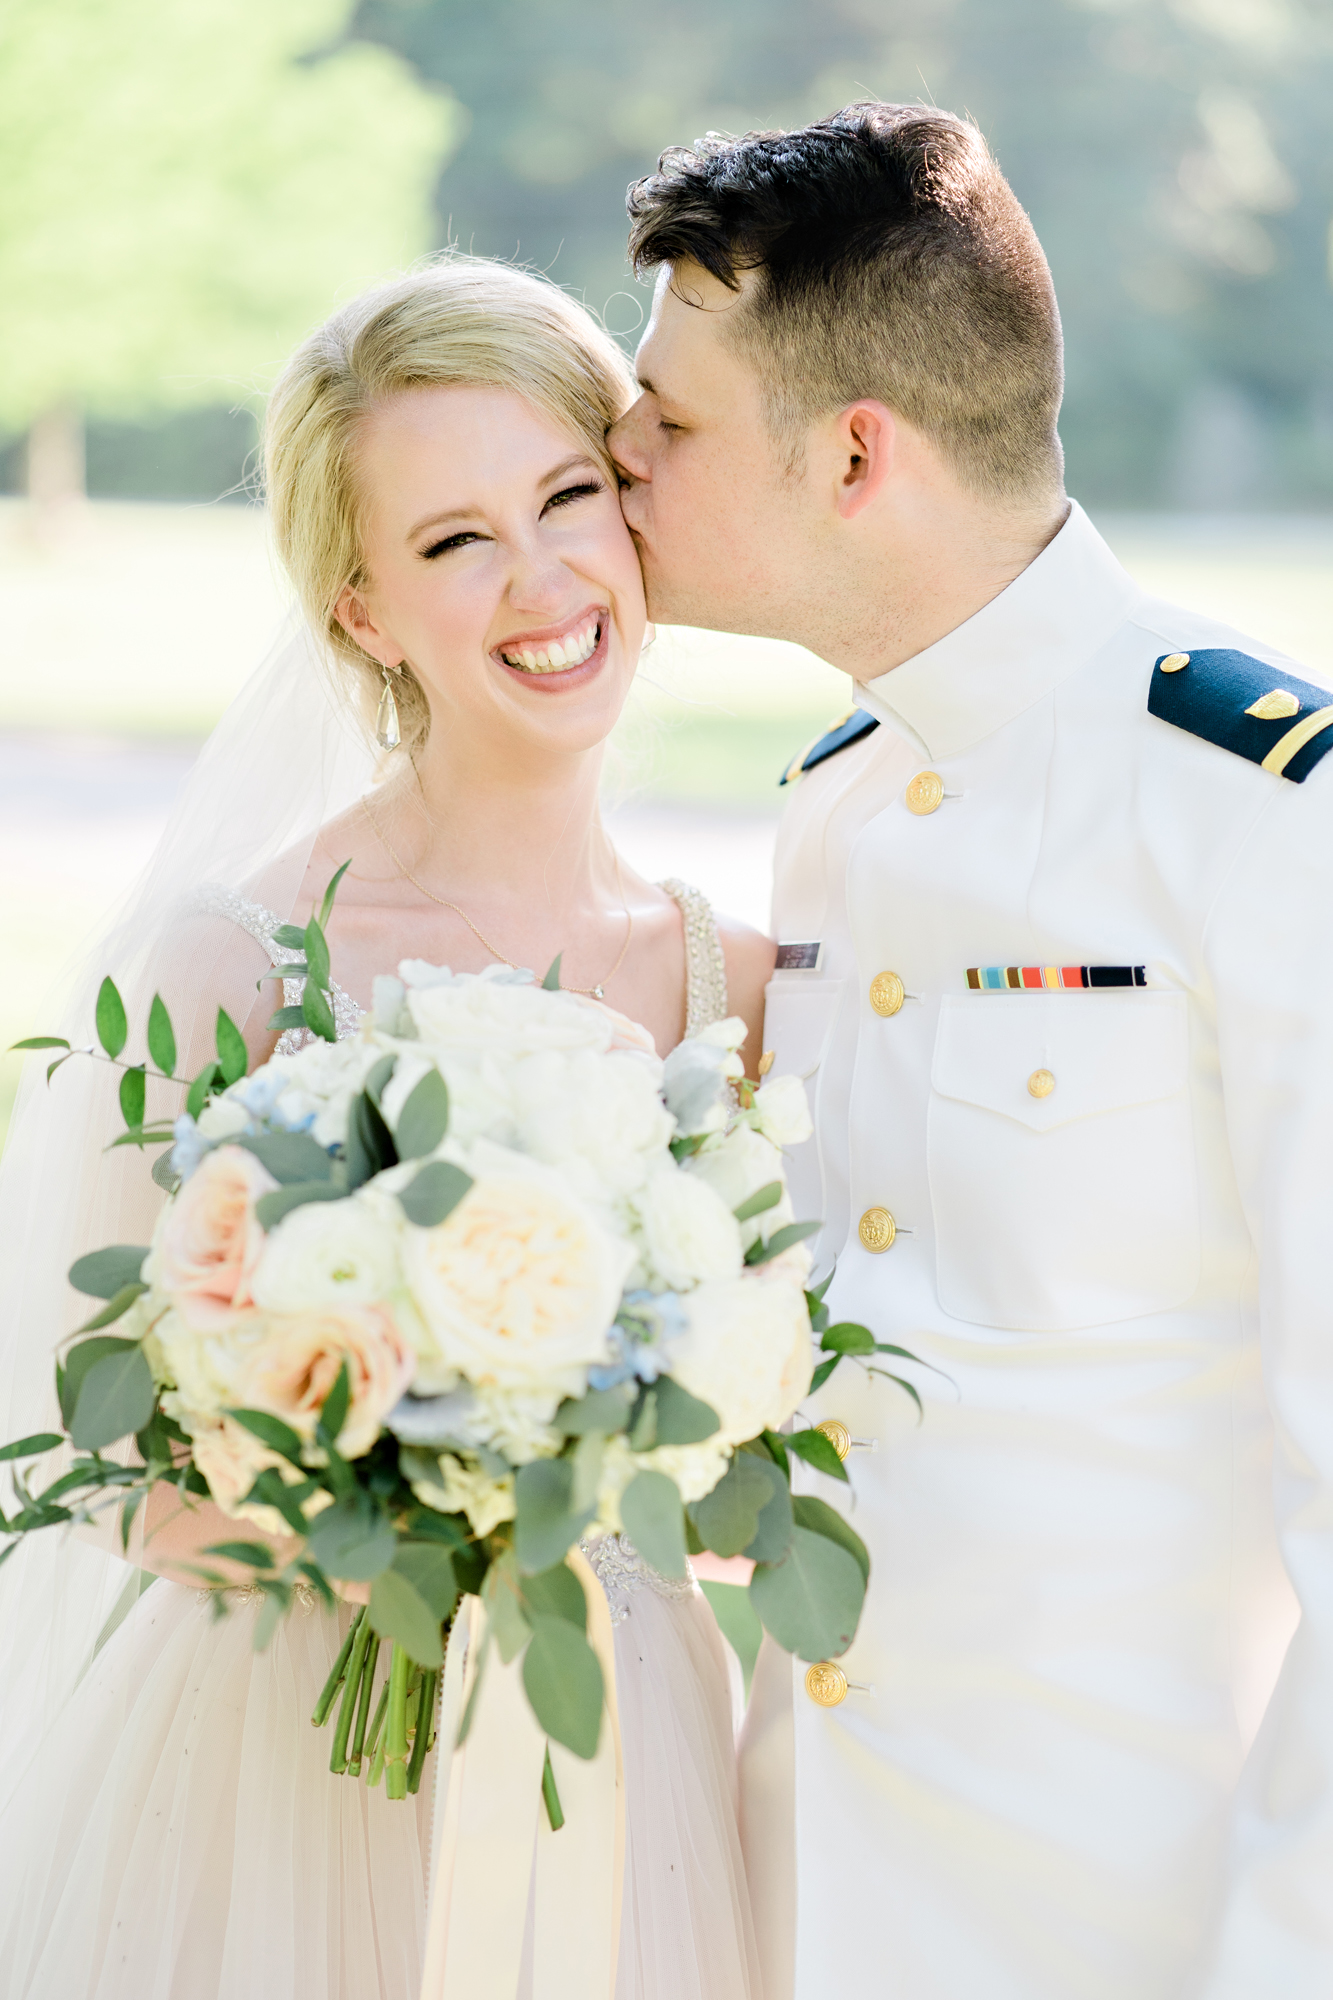 Alabama-Photographers-Nick-Drollette-Wedding-Photography-147.jpg